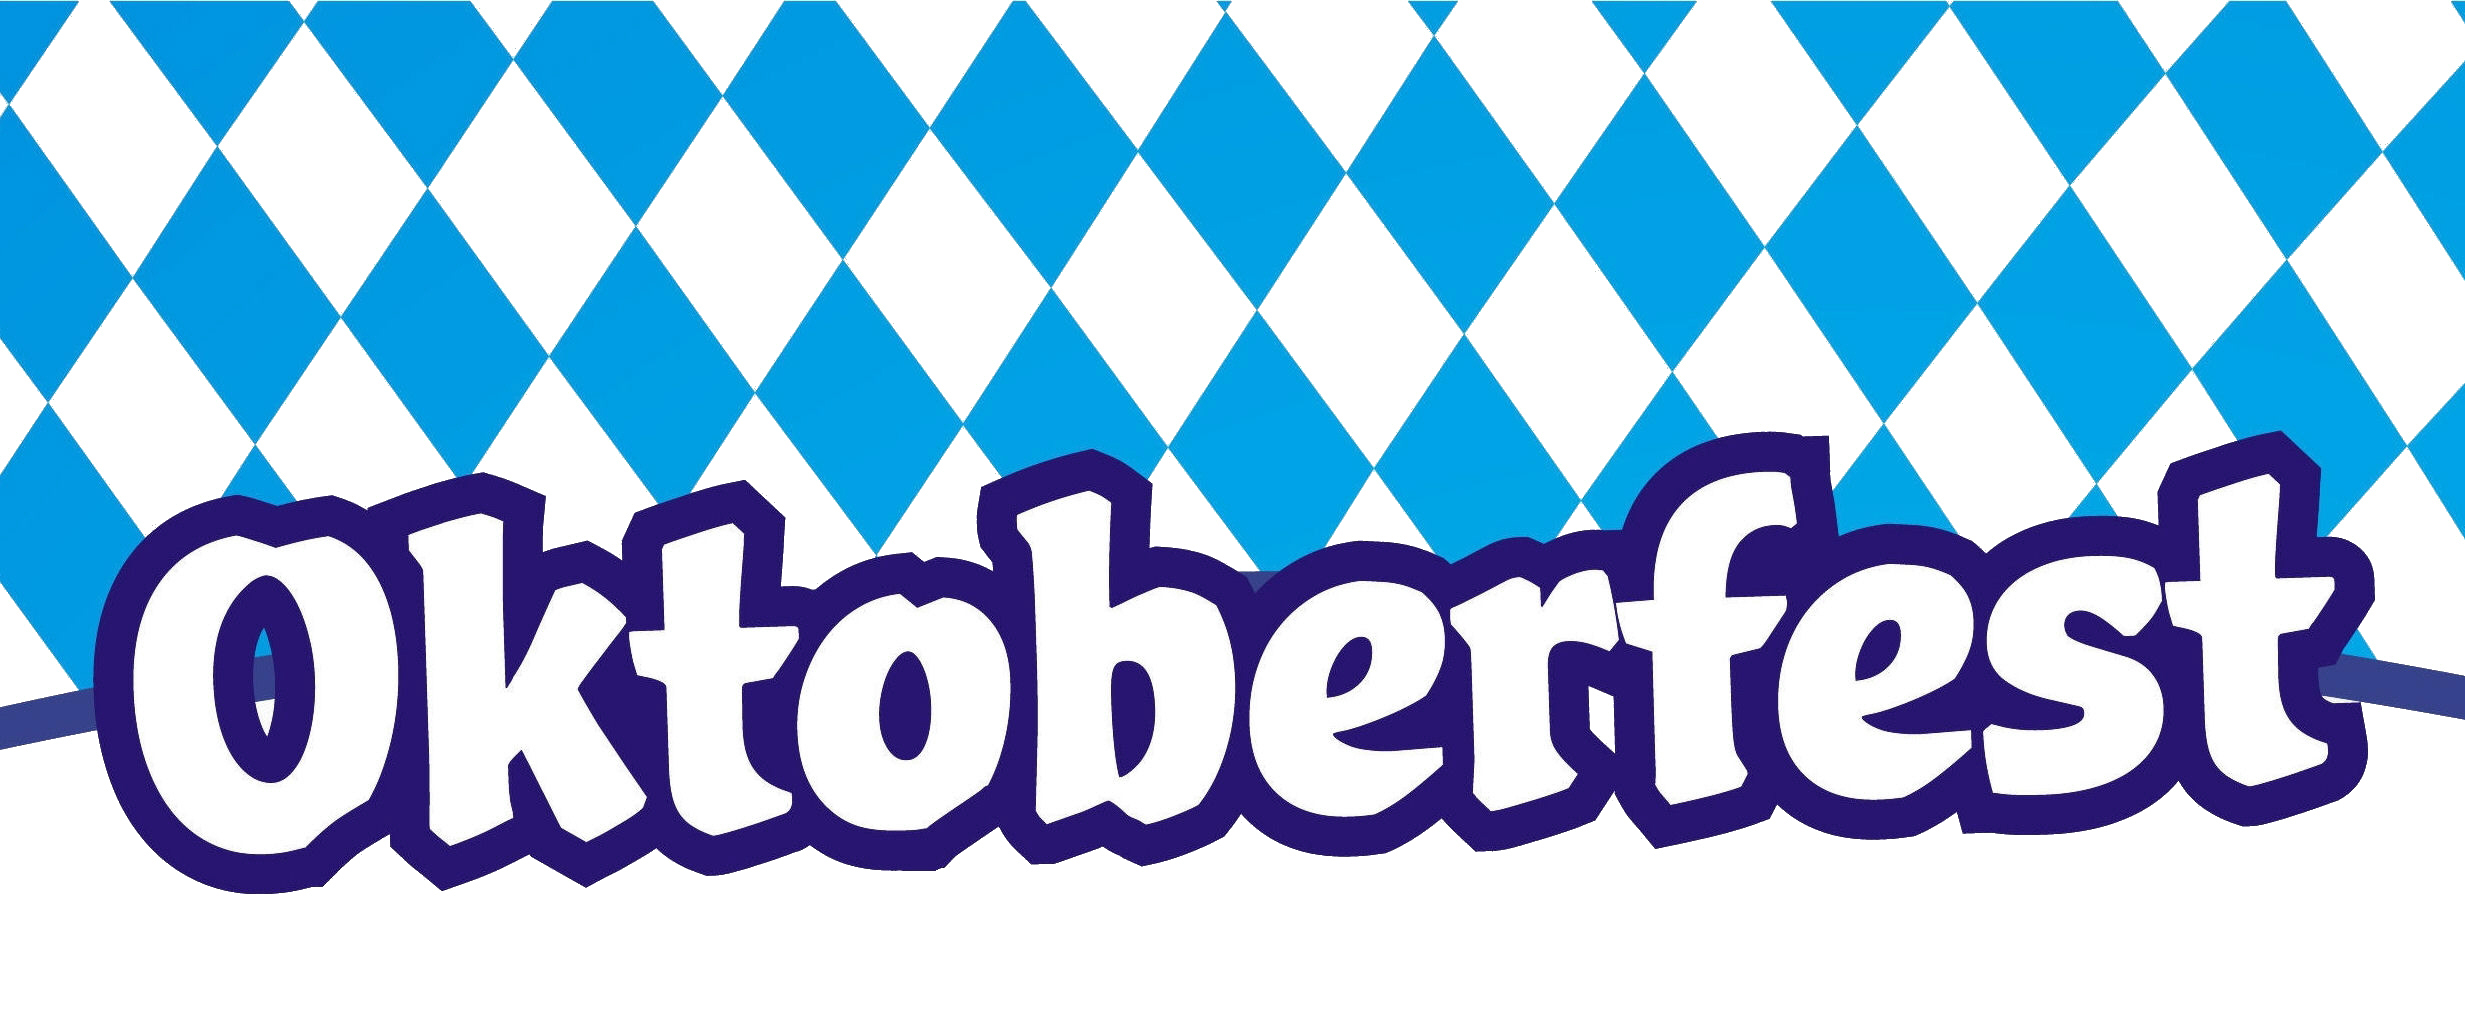 100 5 oktoberfest aachen 2017